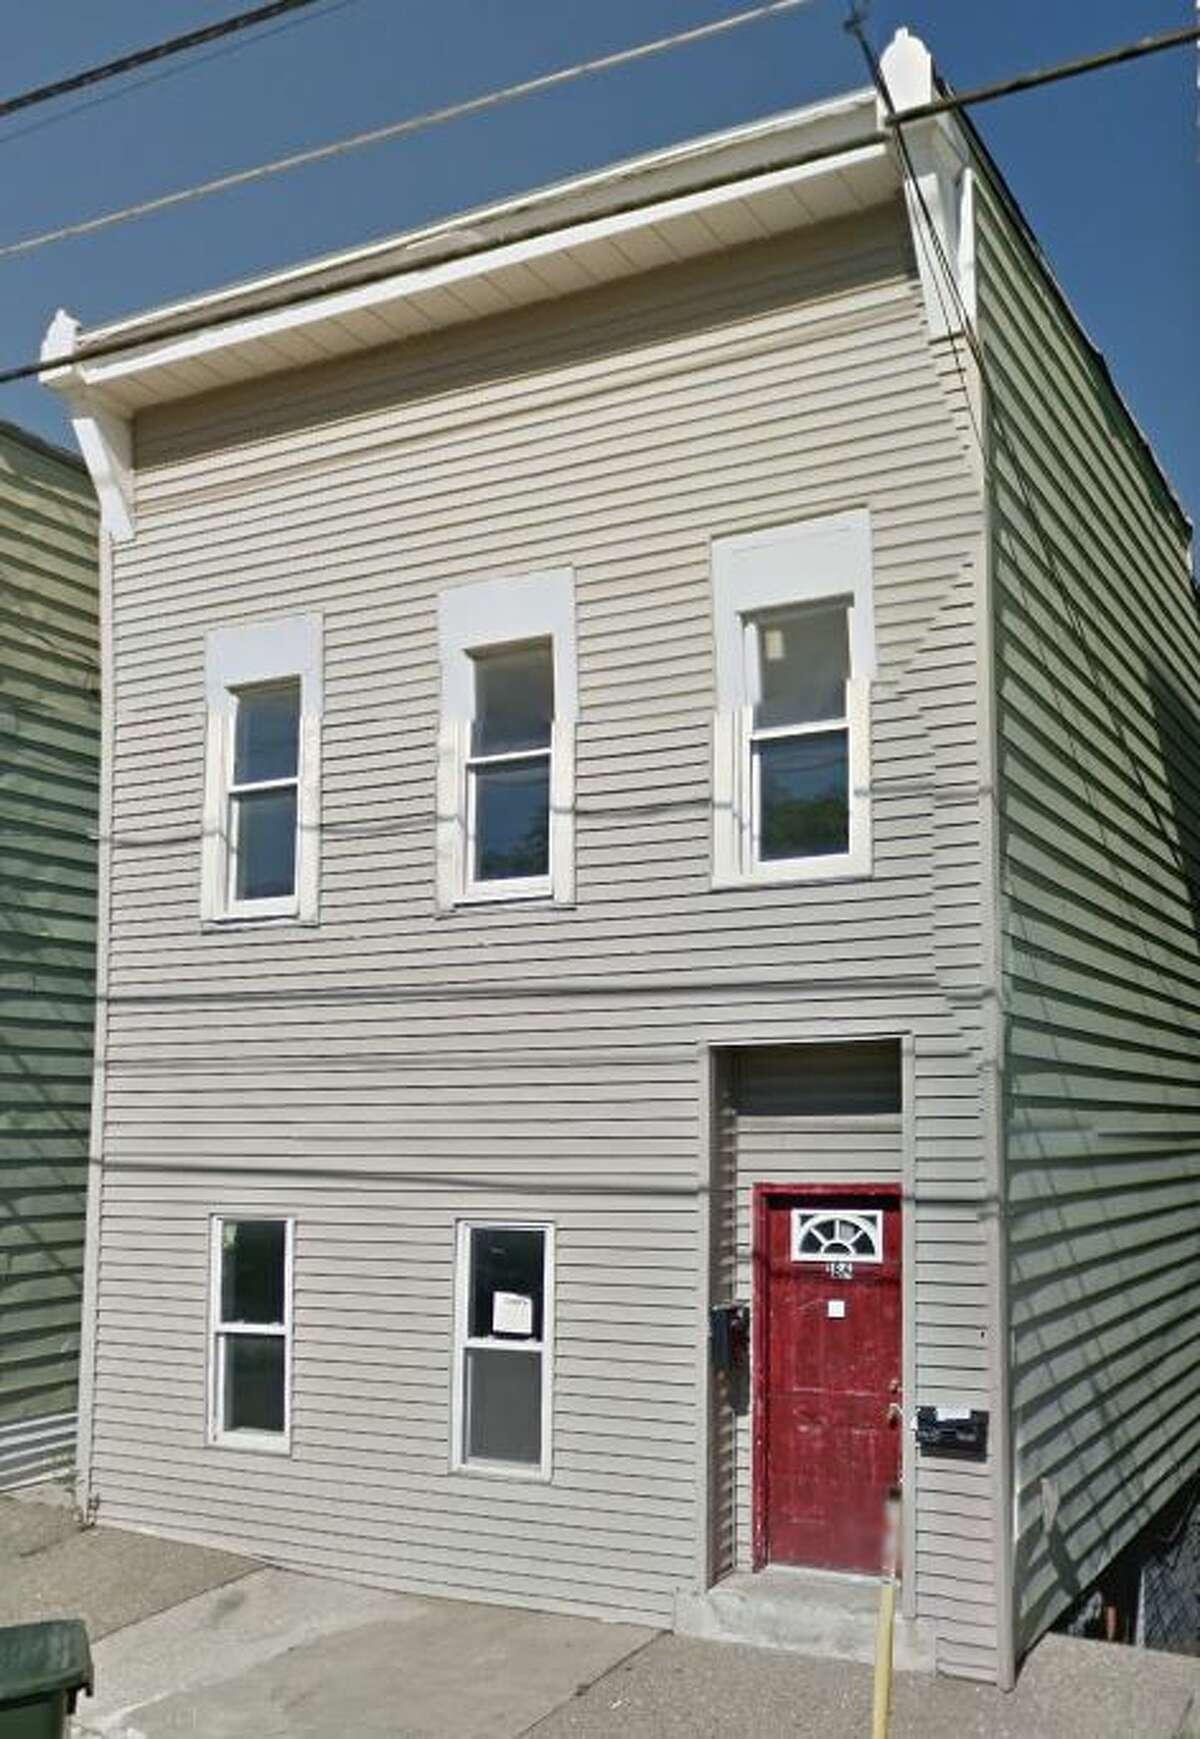 186 Main St., Cohoes, $11,000 (Photo: Google)